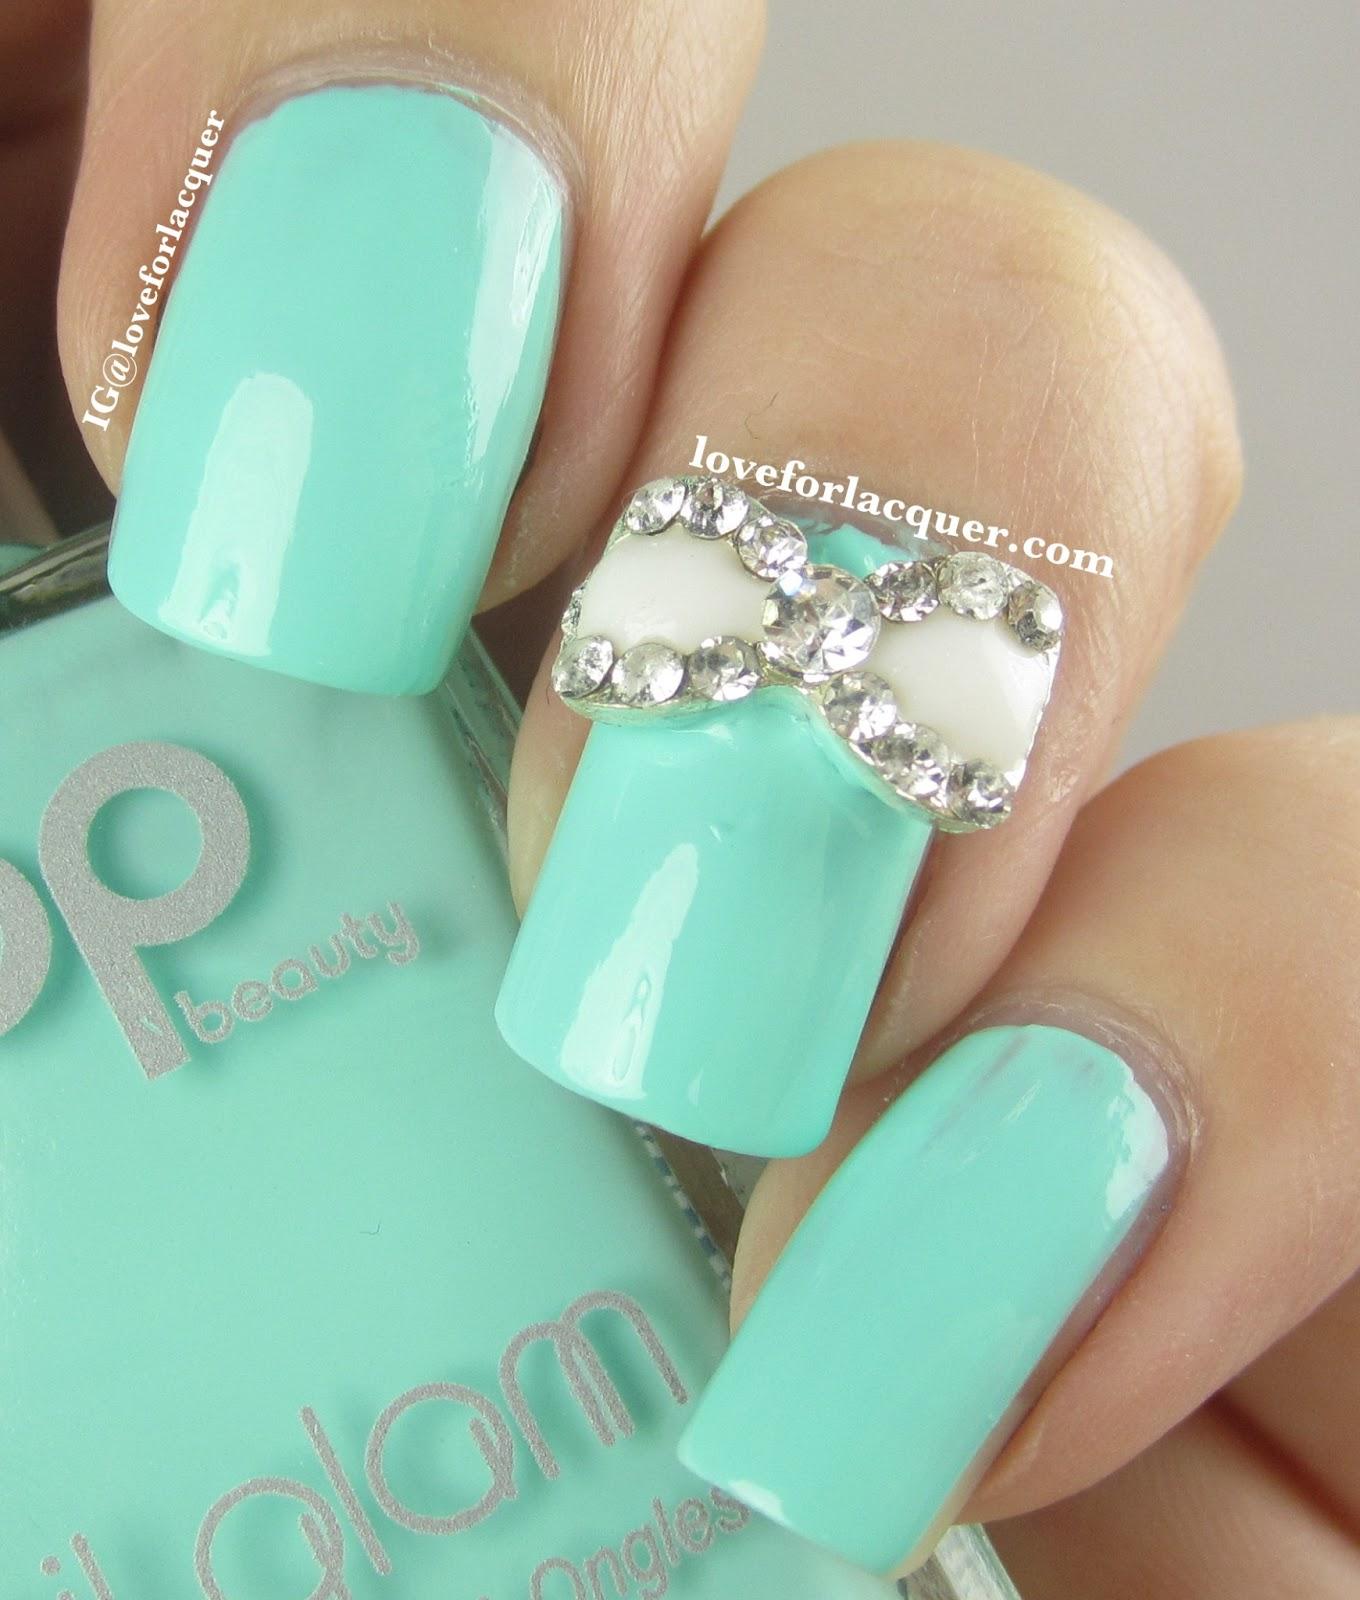 Magnificent Pro Nails Design Frauenfeld Mold - Nail Art Ideas ...